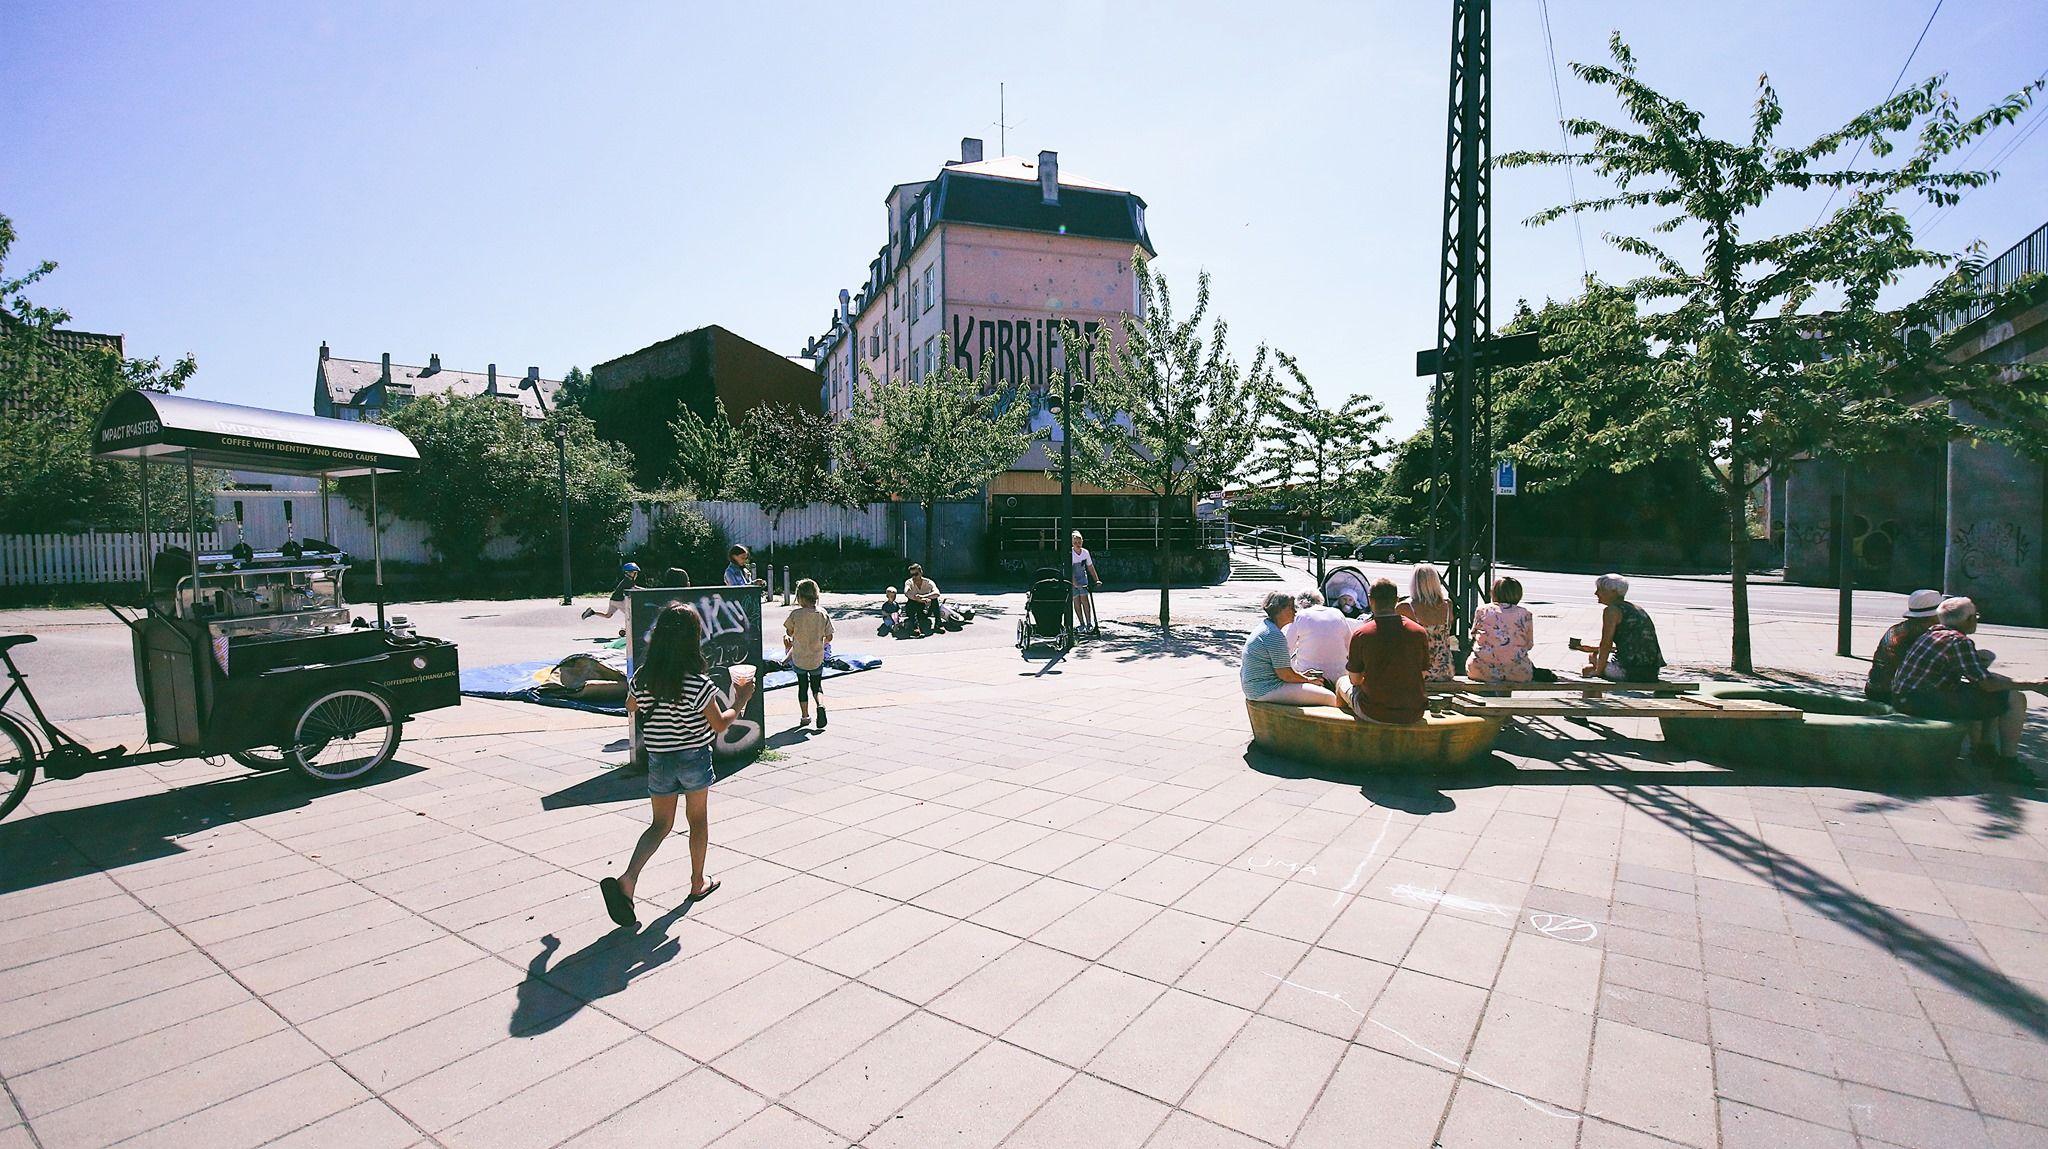 Aksel Sandemoses Plads